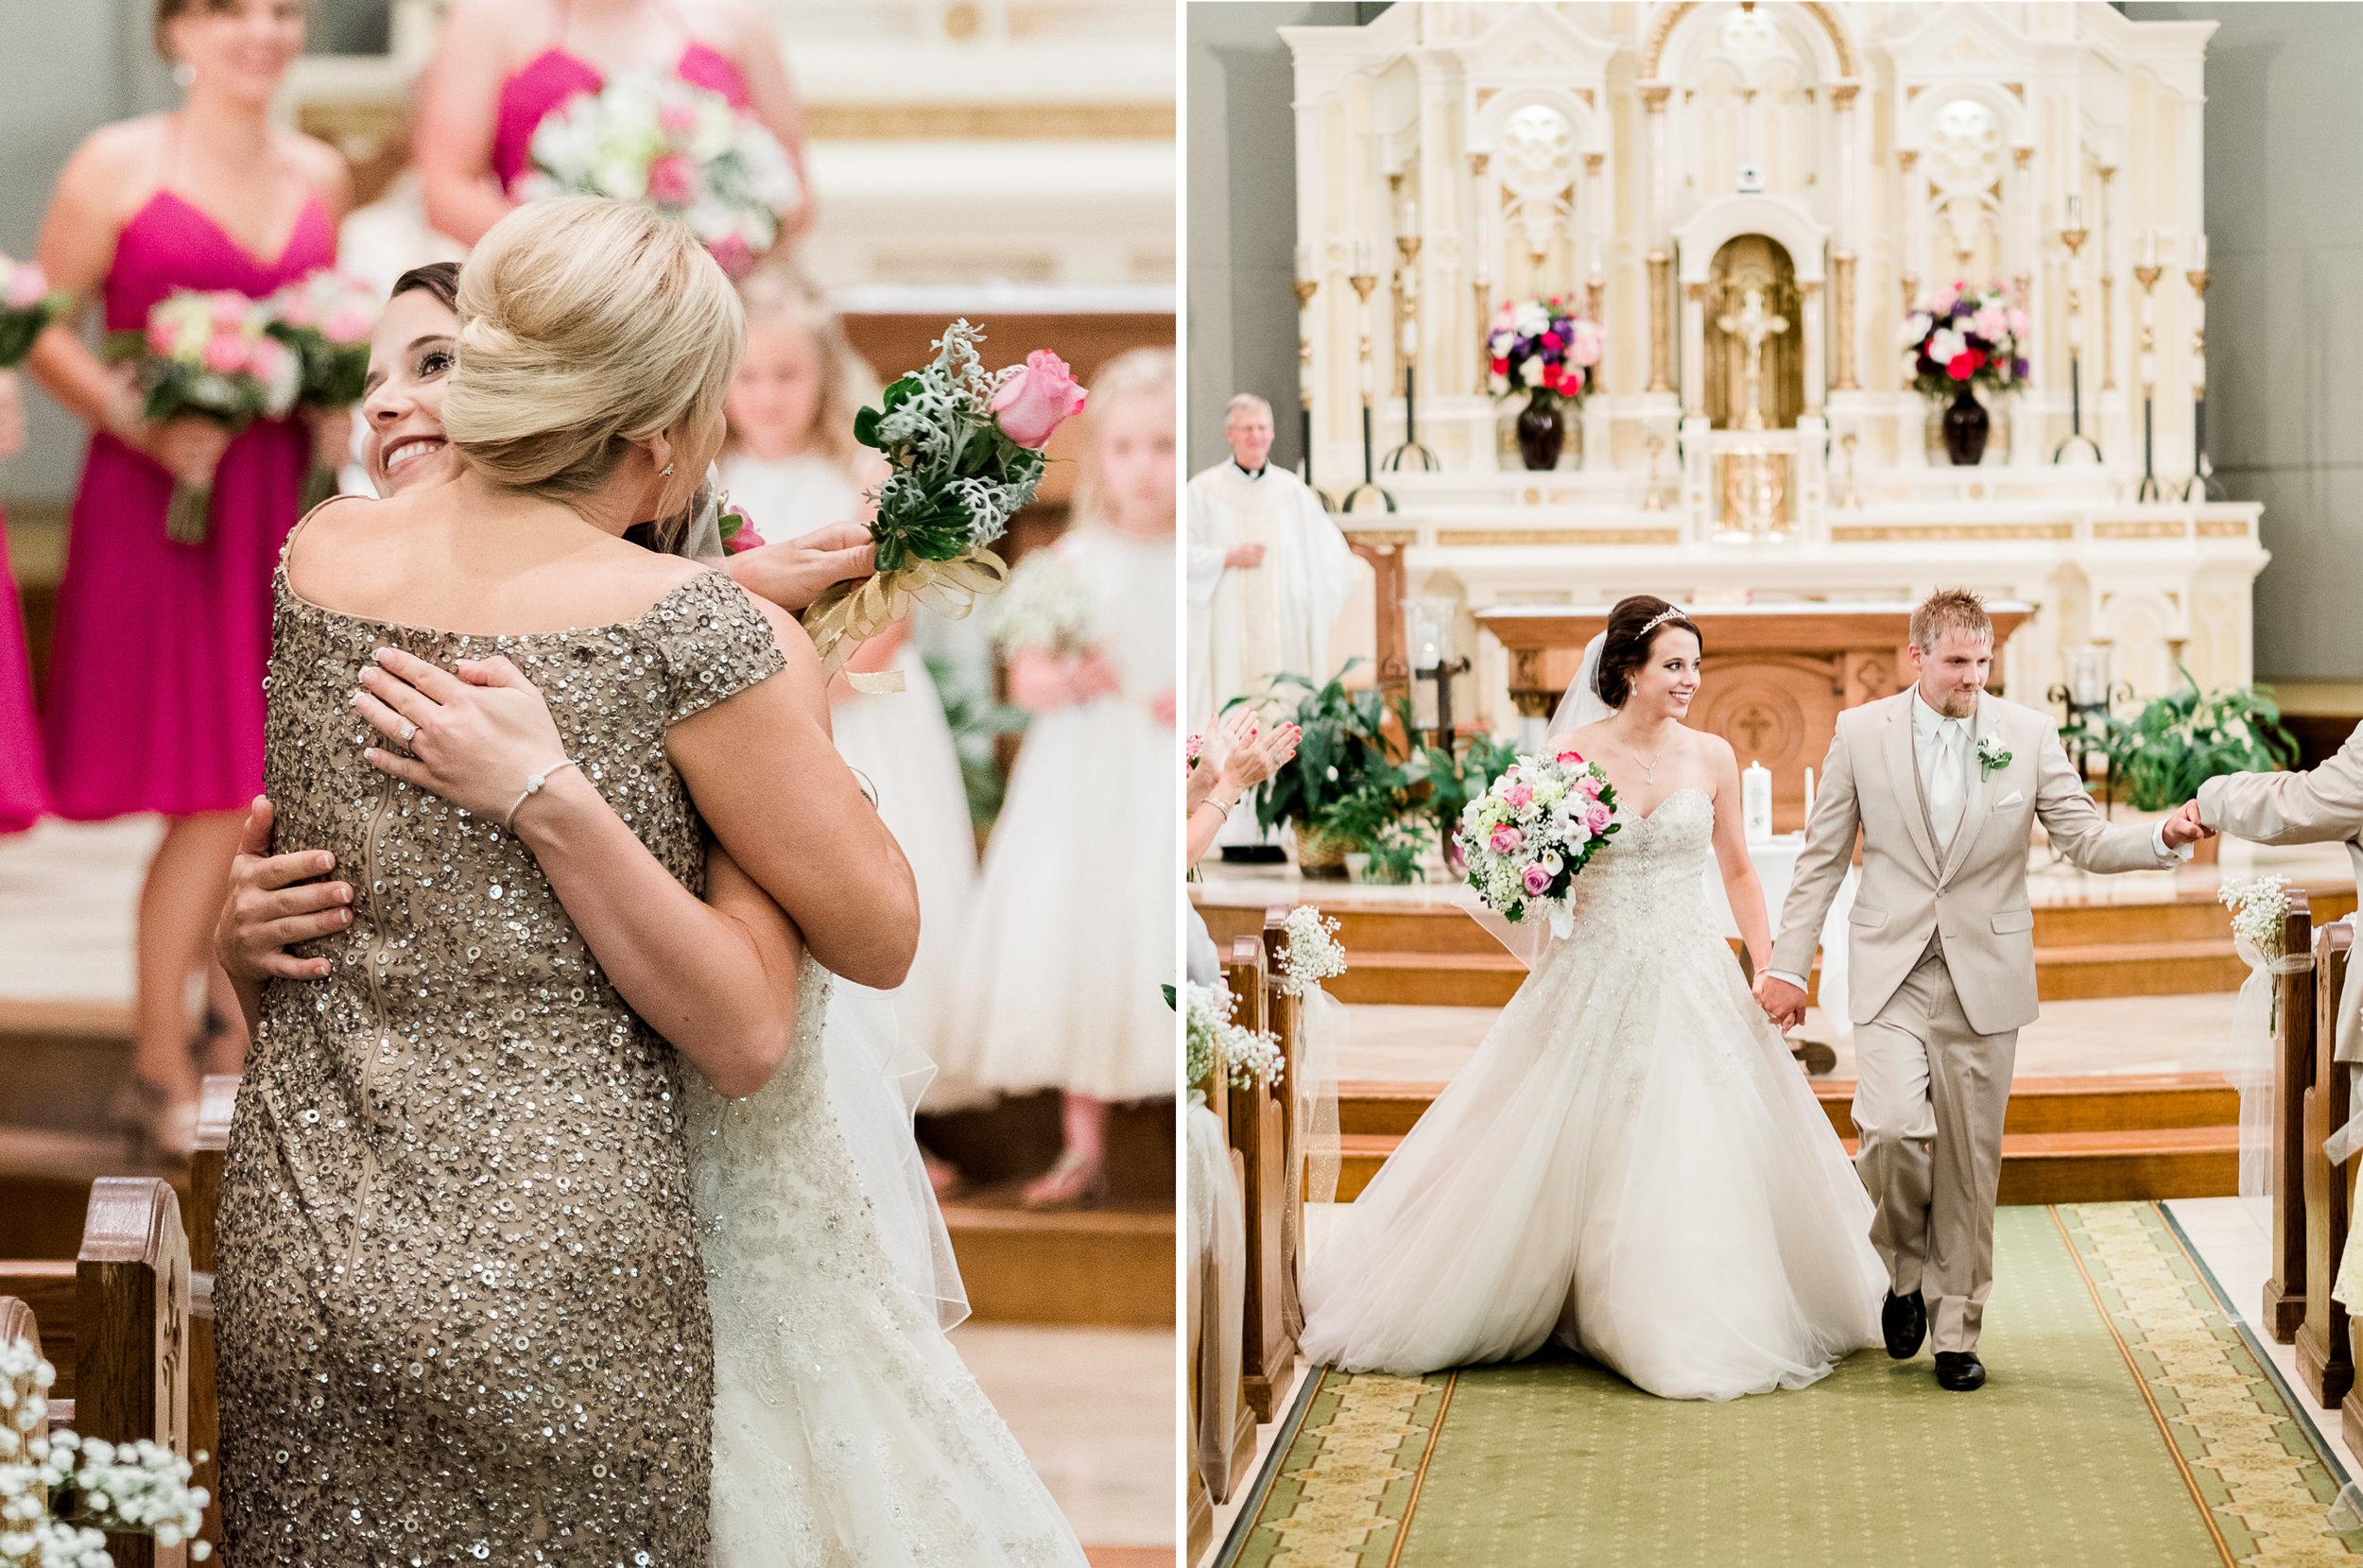 Catholic wedding in Marshall MN